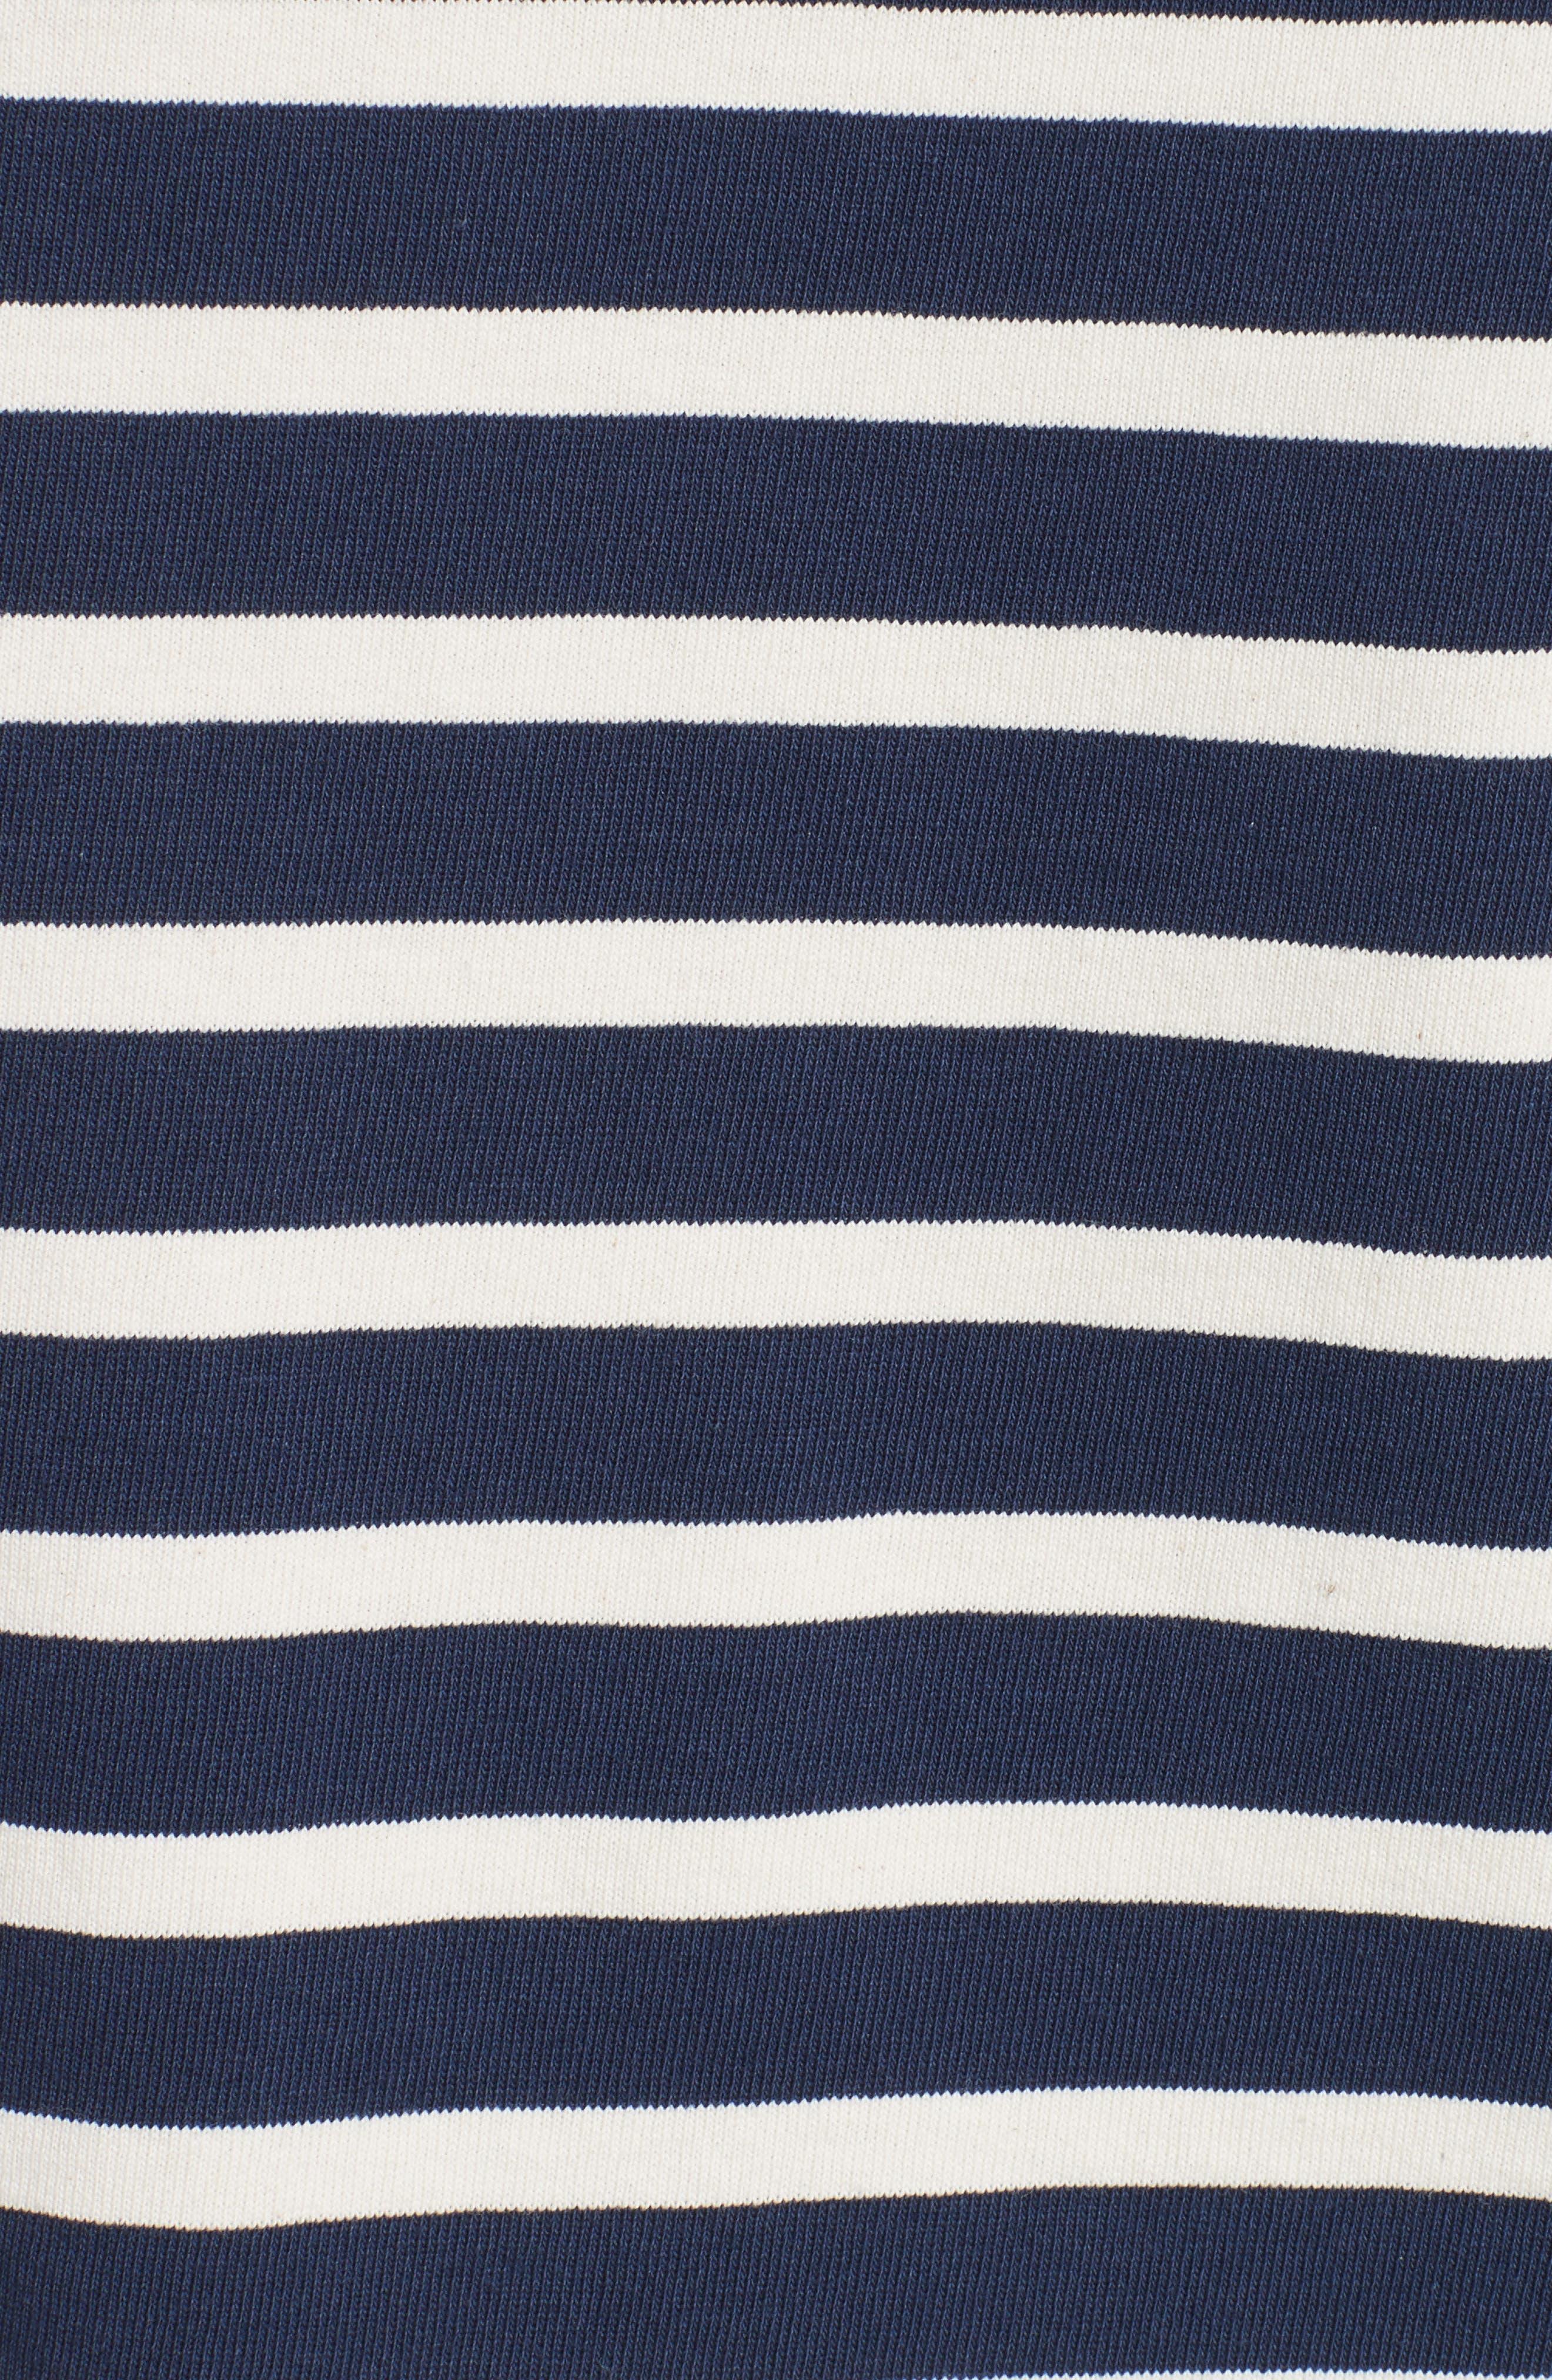 Alternate Image 3  - MARC JACOBS Reverse Breton Stripe Bell Sleeve Top